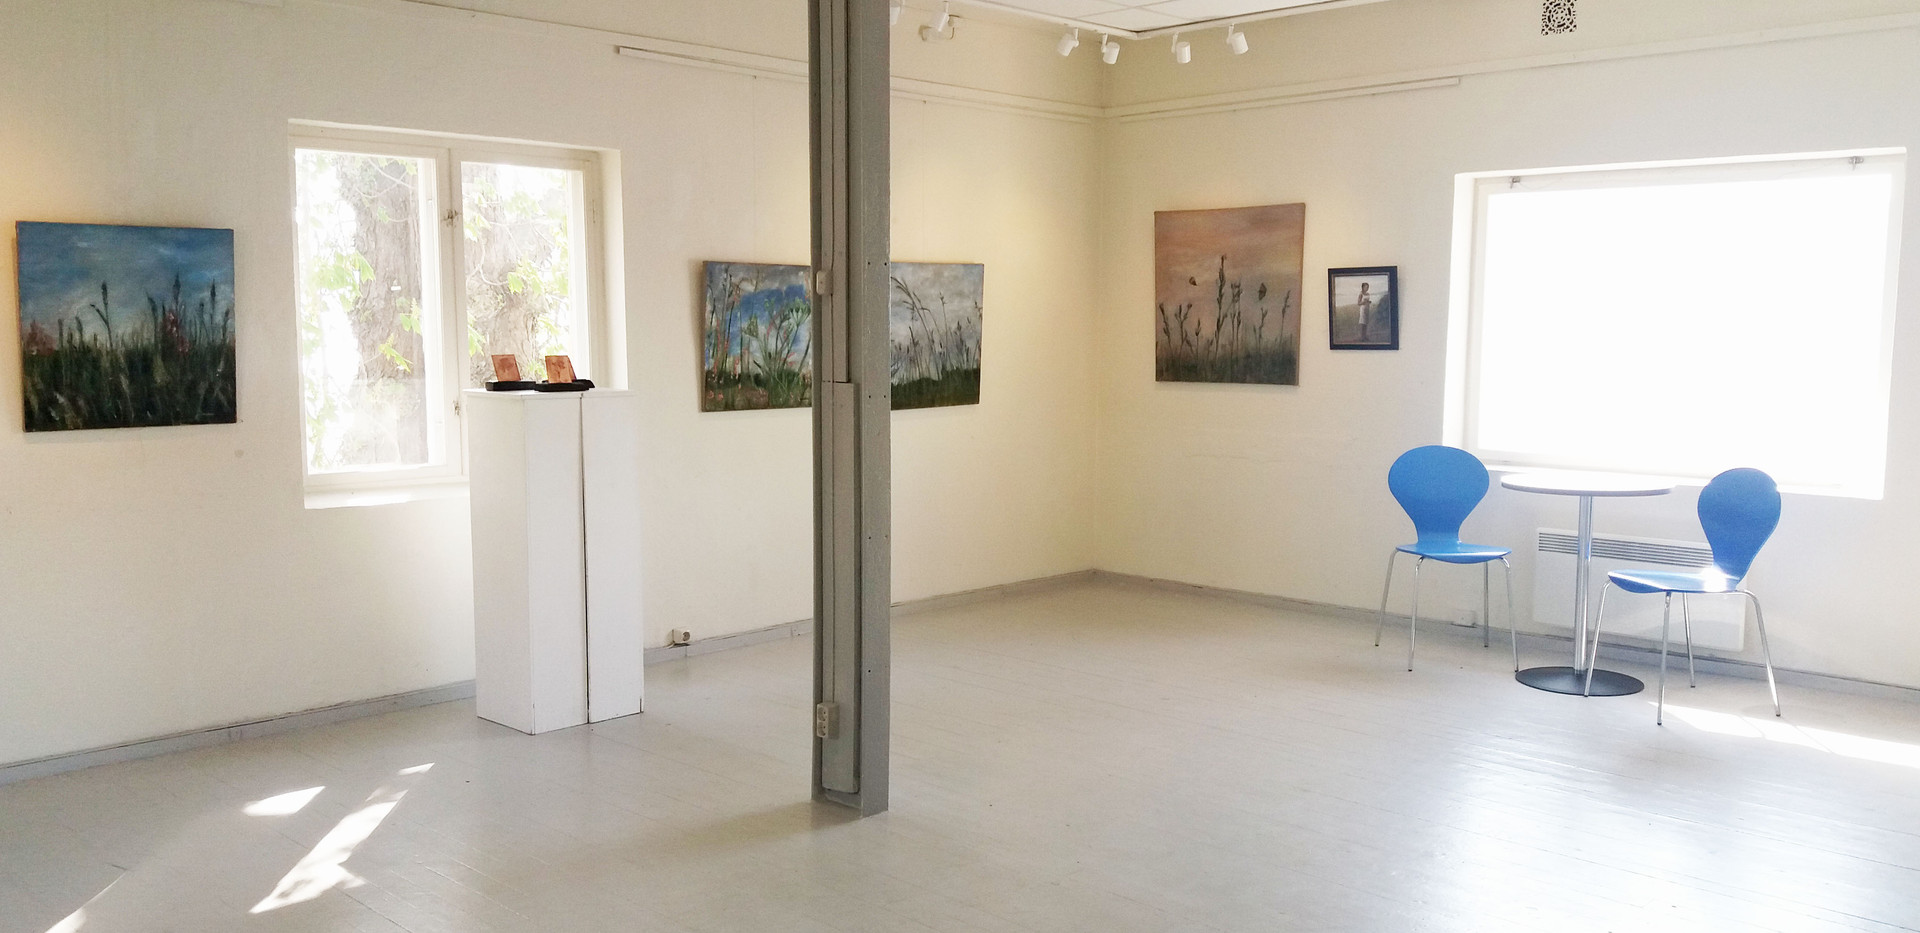 Drøbak Kunstforening 3